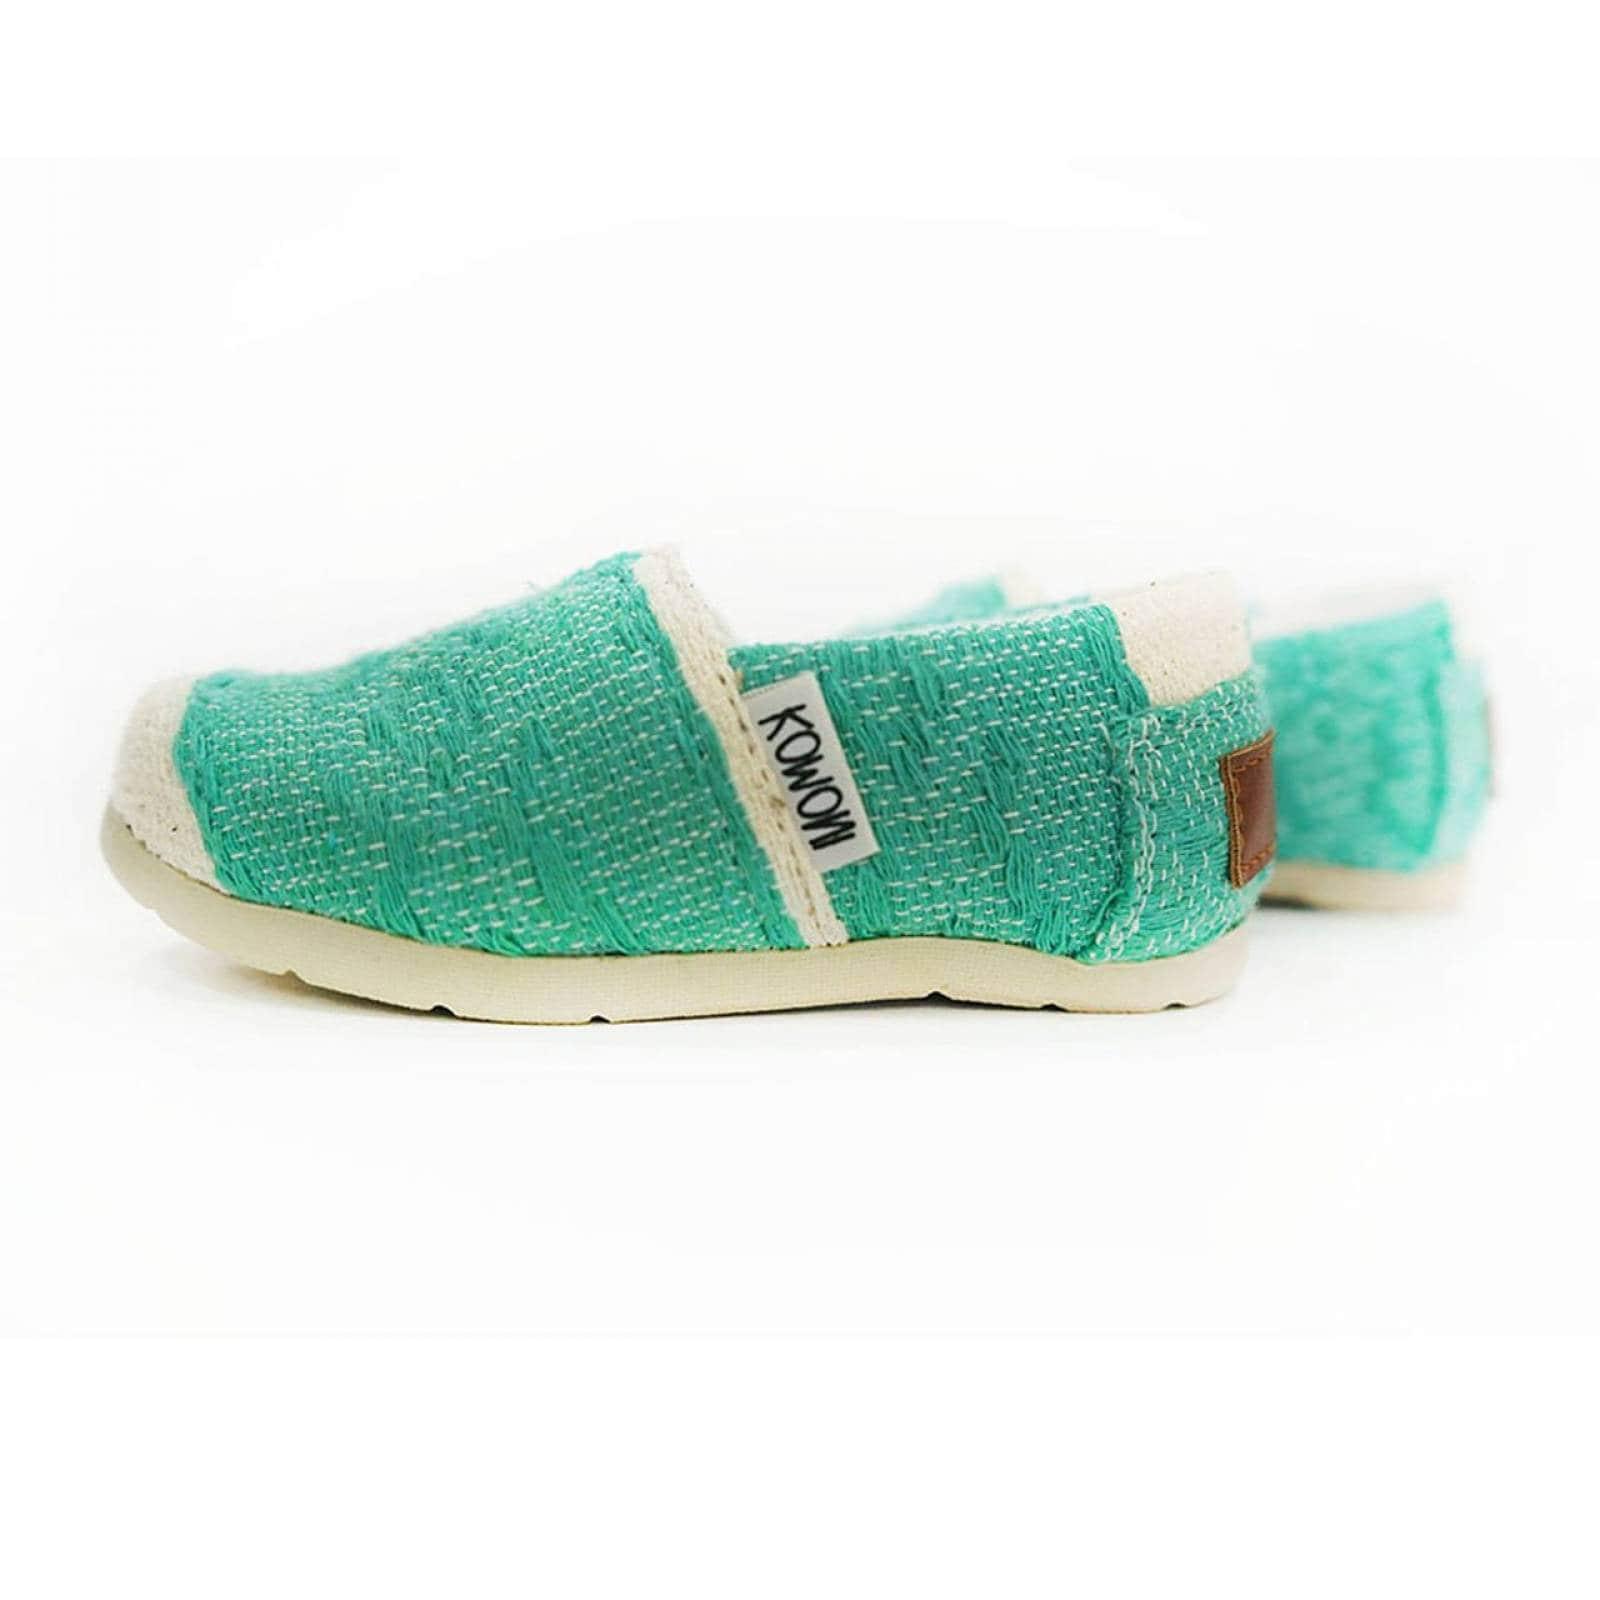 Zapato Alpargata Mini Jacinta Artesanal Tela Infantil Verde Komoni Talla: 17